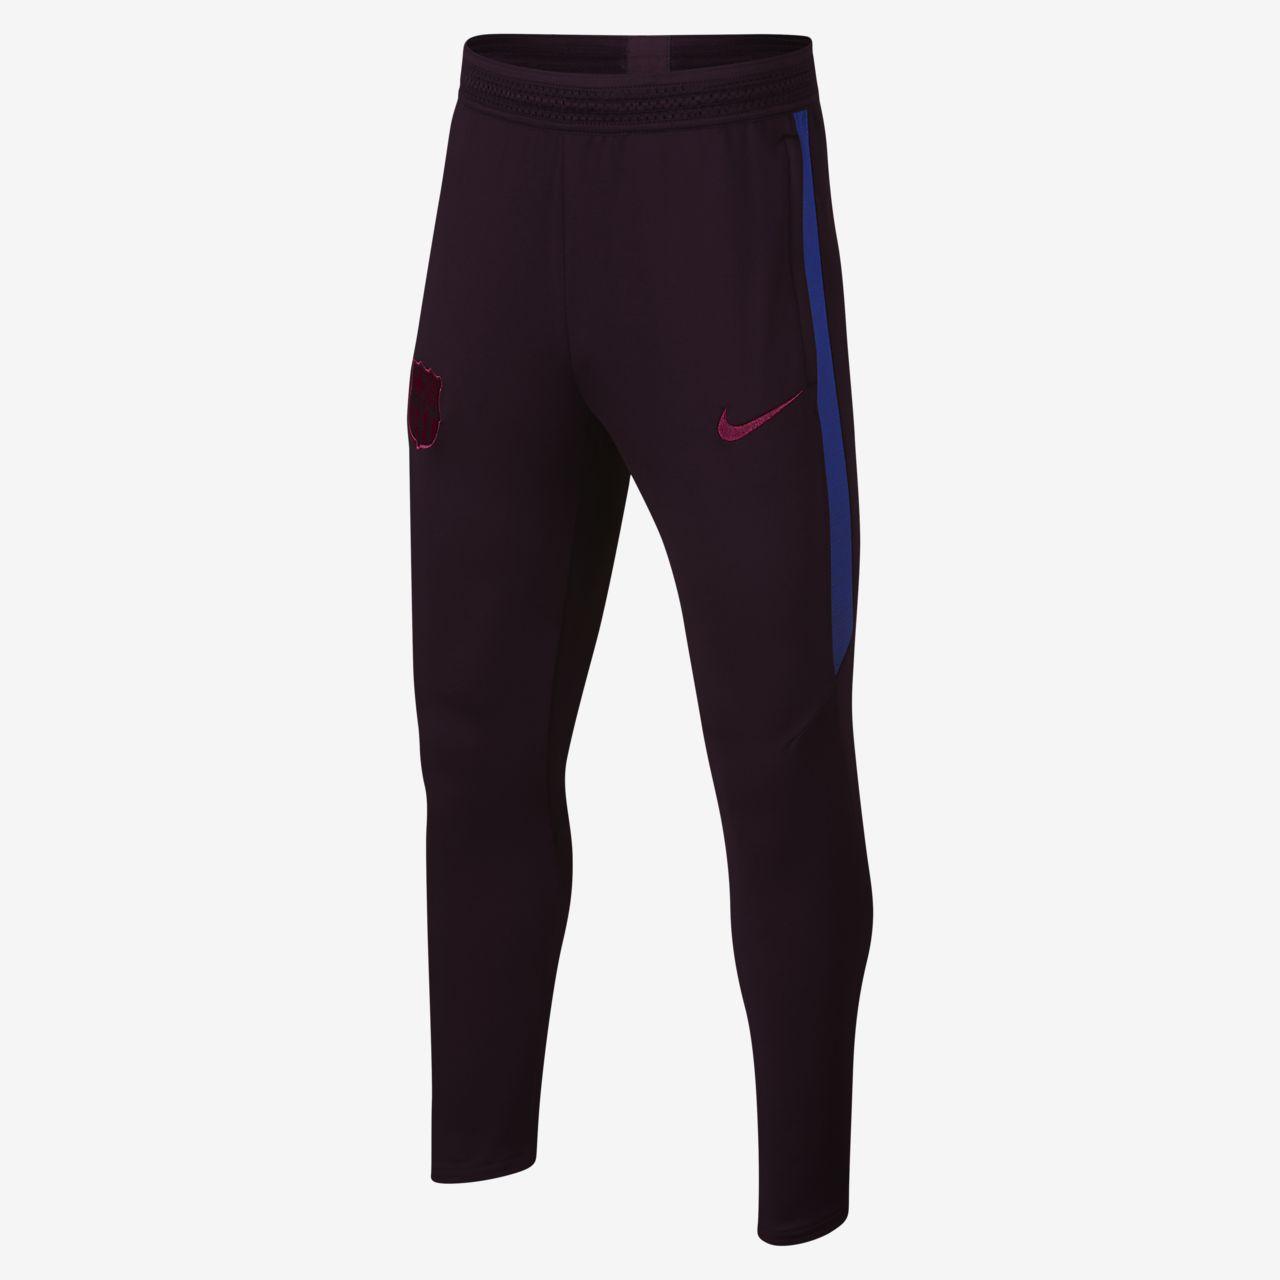 Pantalones de fútbol para niños talla grande Nike Dri-FIT FC Barcelona Strike